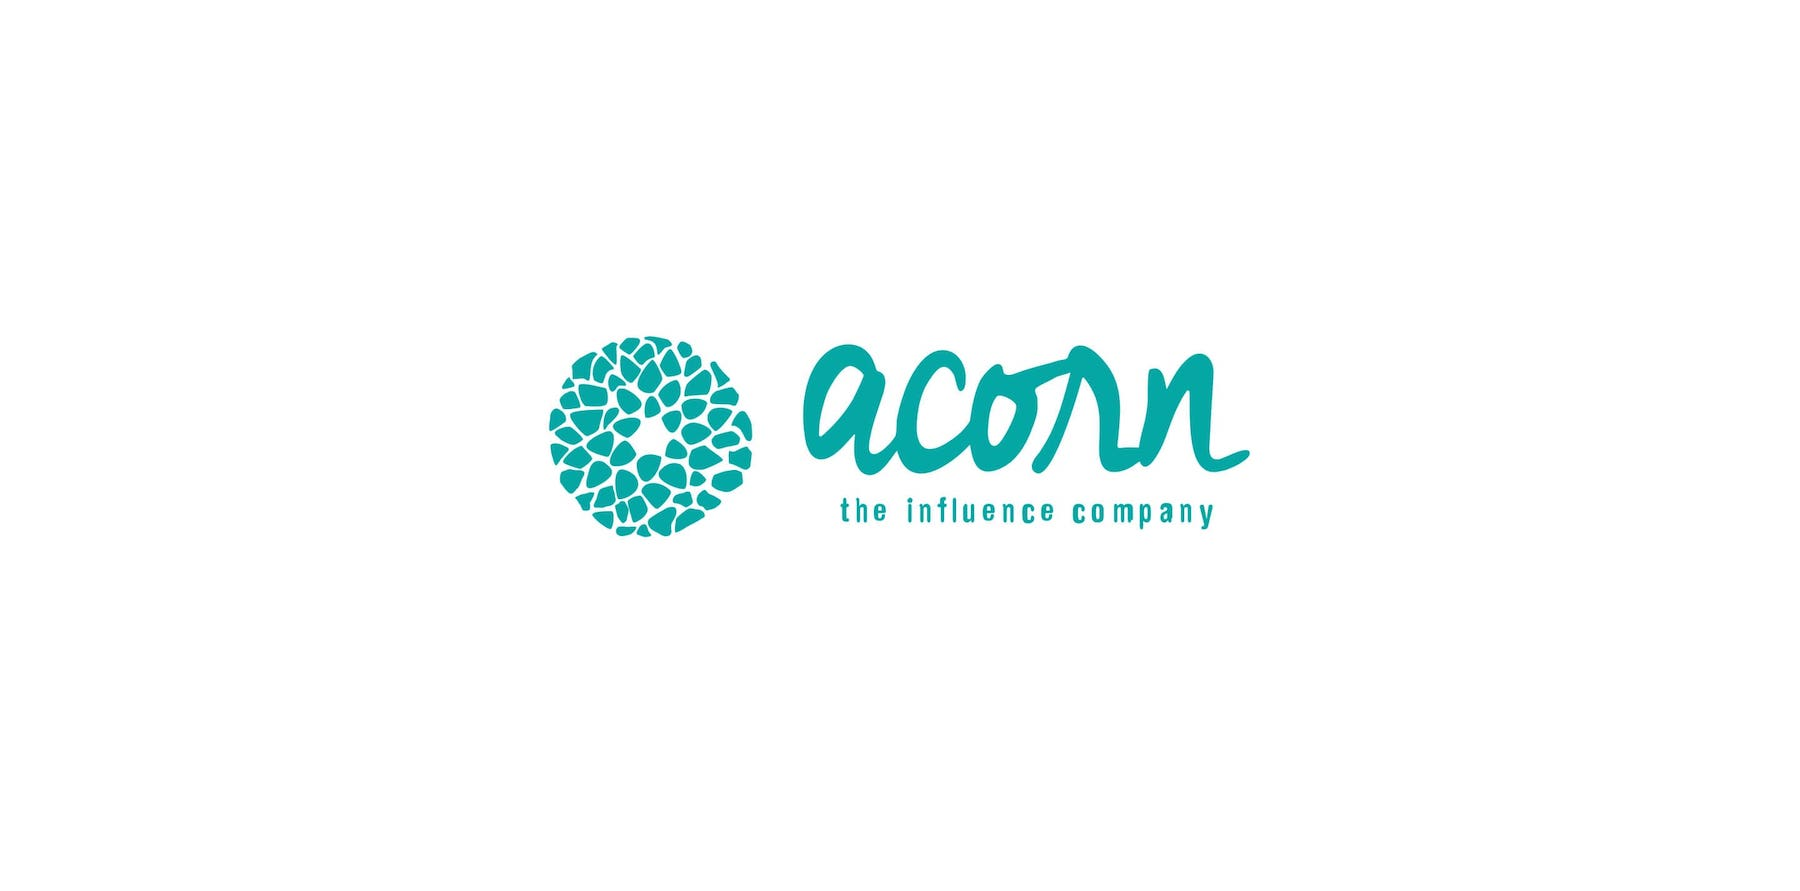 acorn influence logo